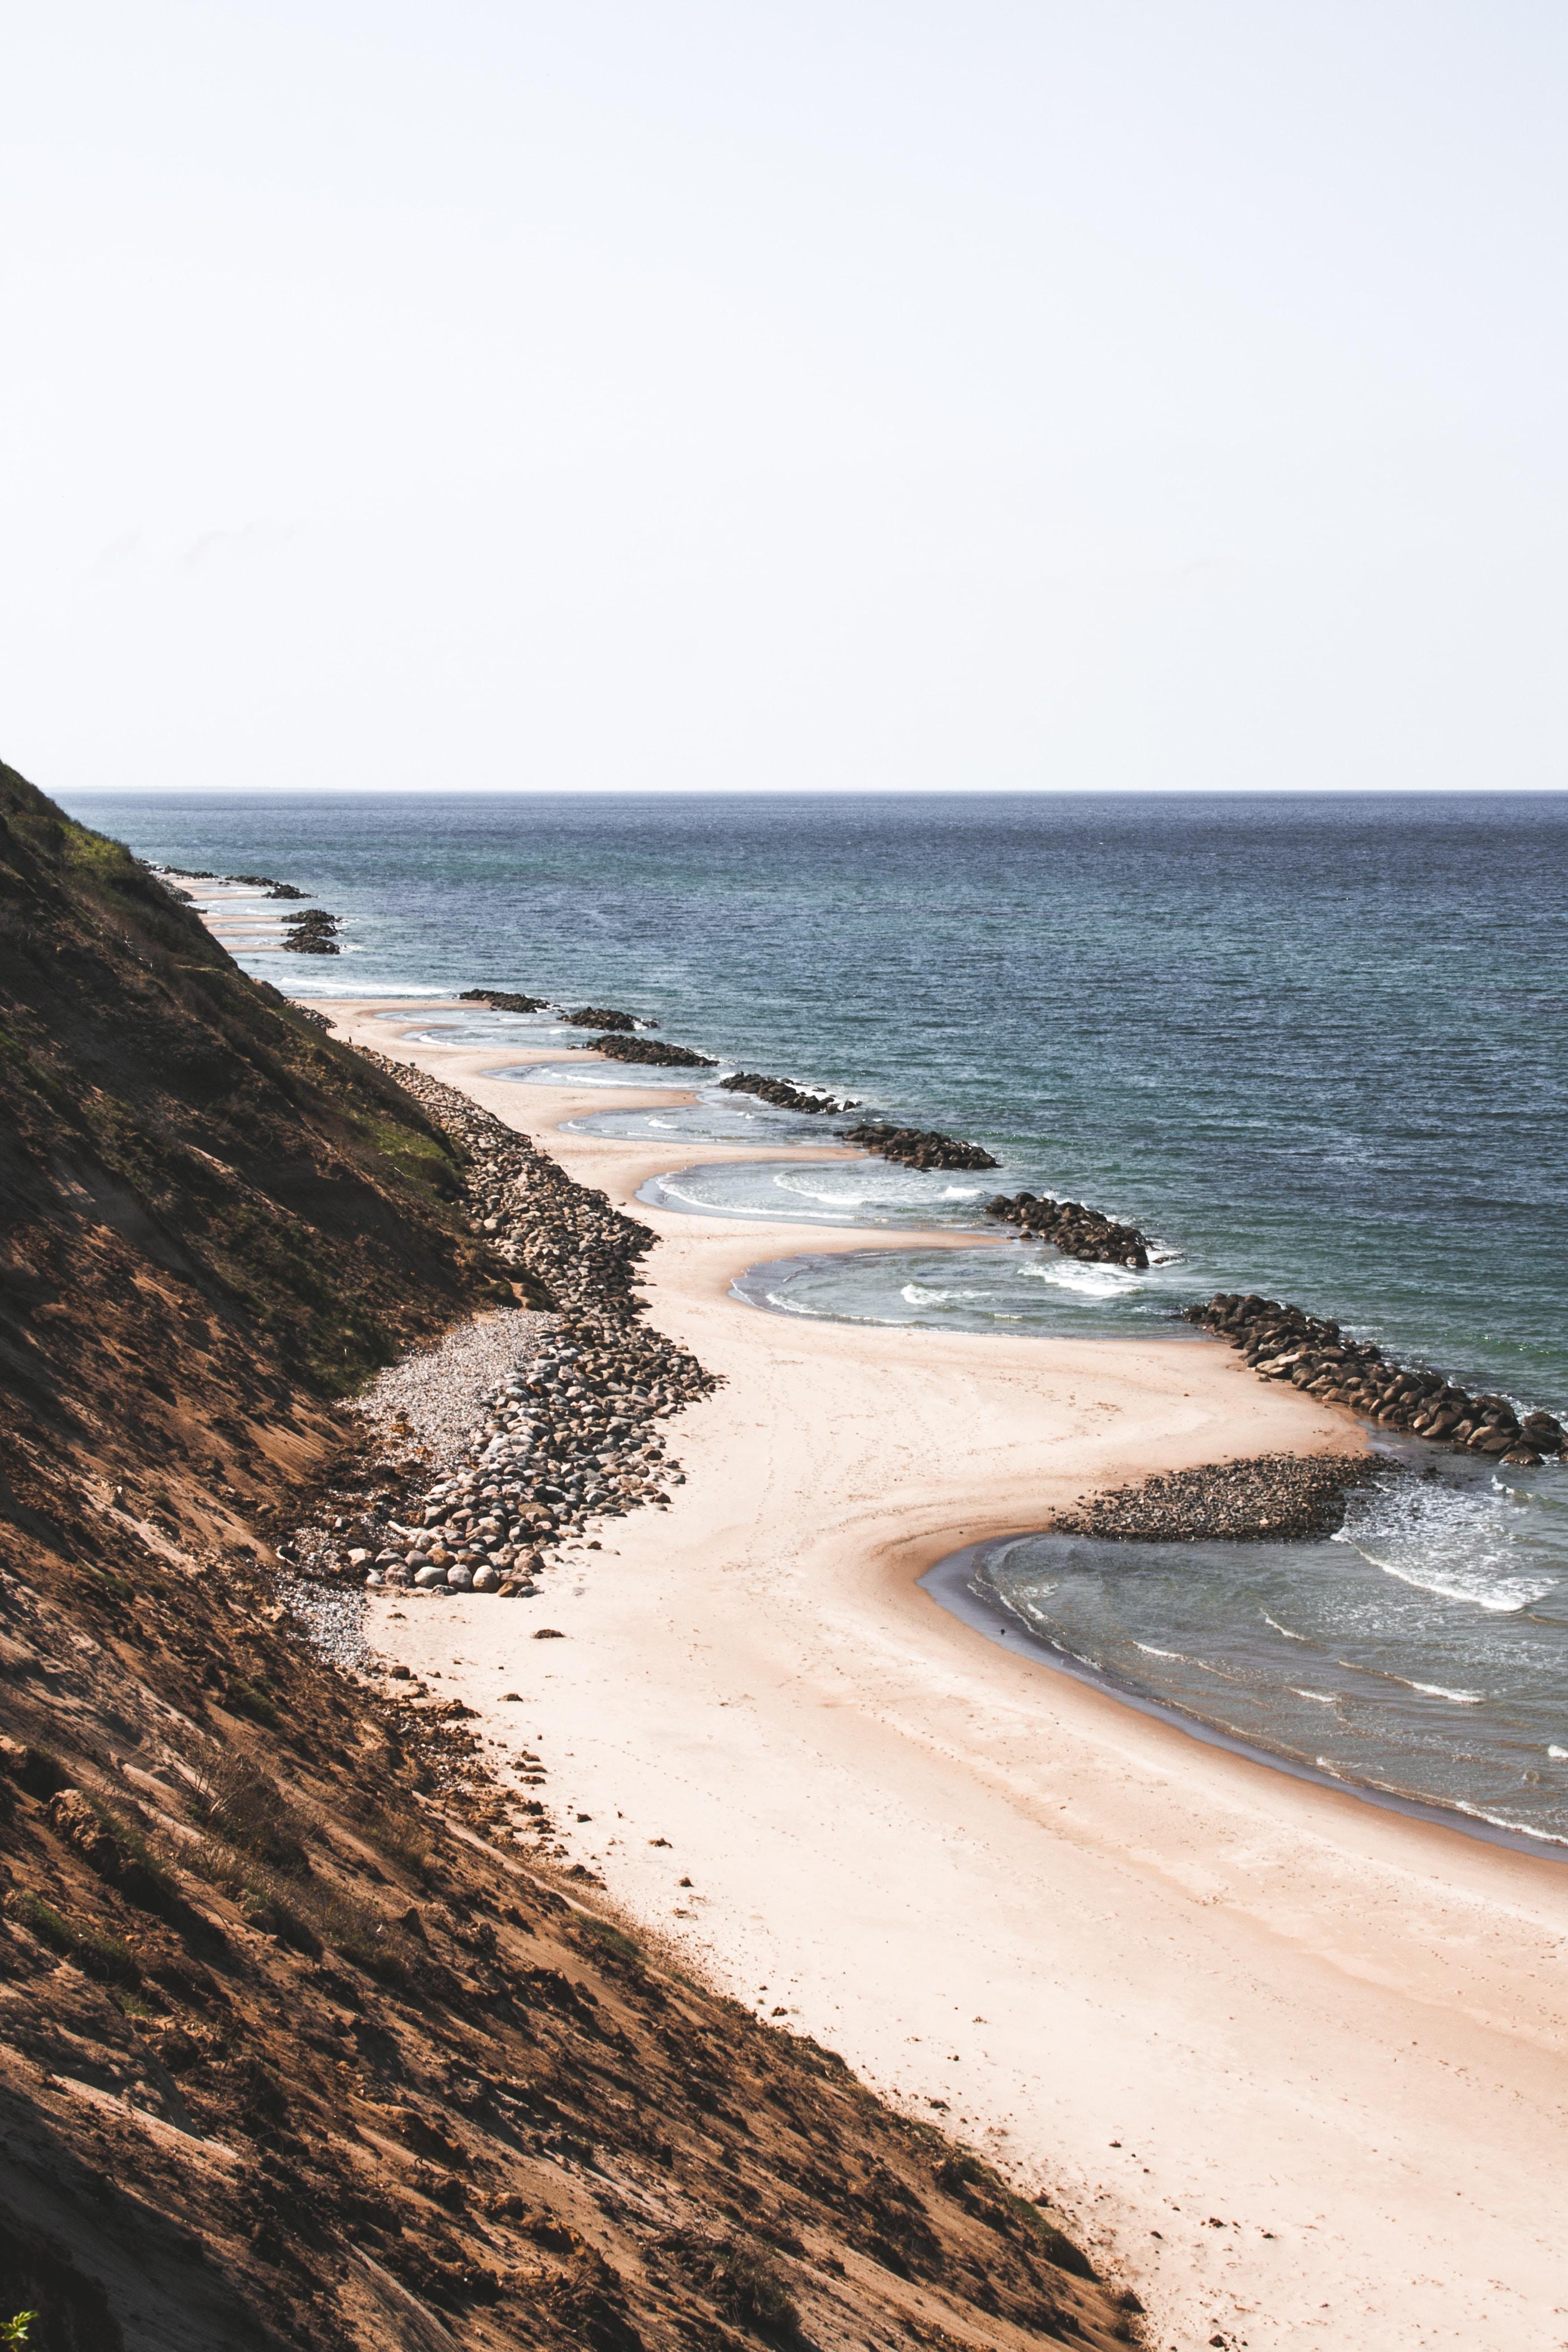 seashore near cliff during daytime